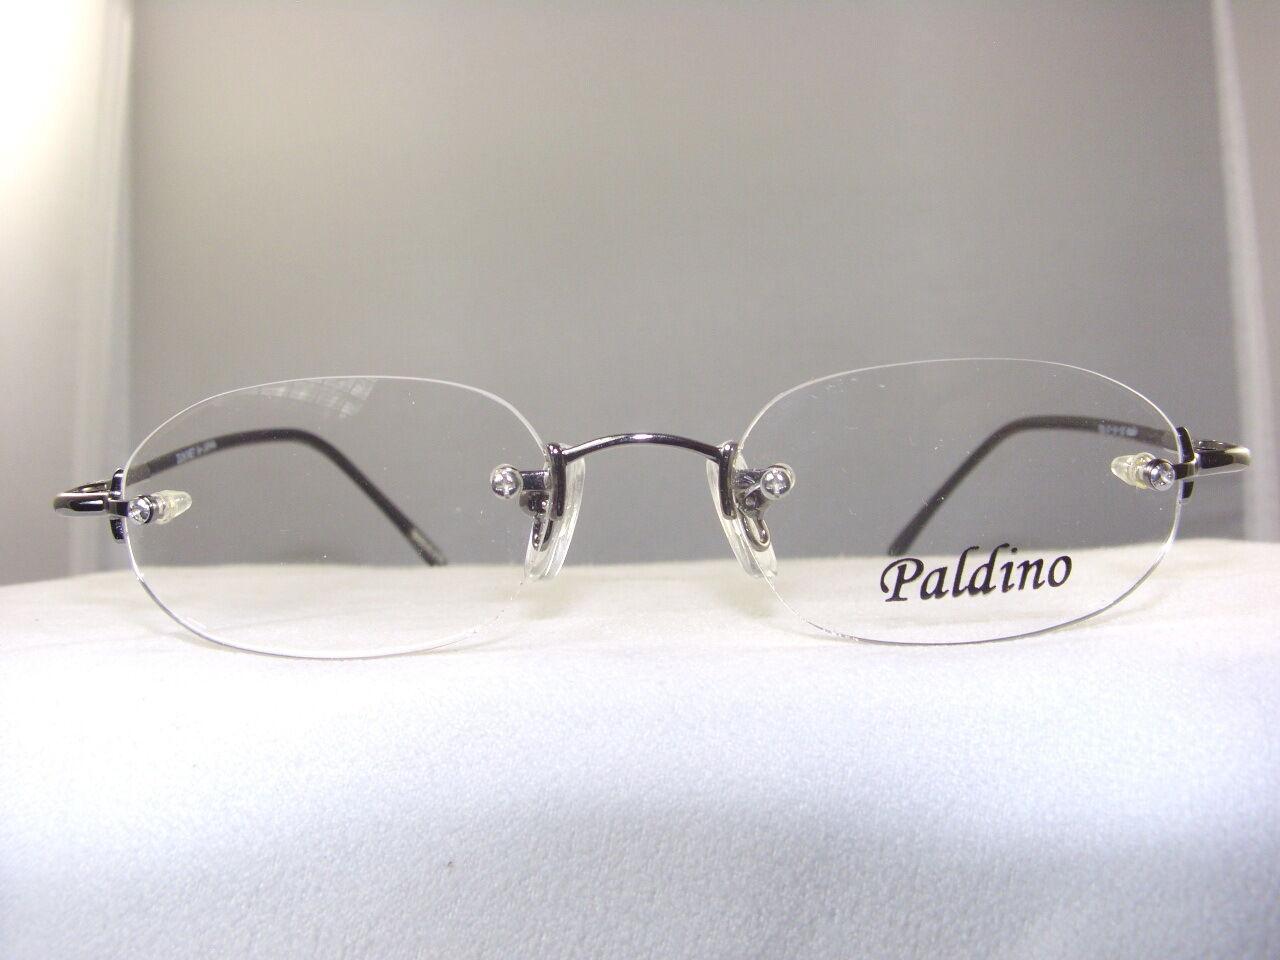 Eyeglass Frames Temple Pieces : PALDINO #708 GUNMETAL 3 PIECE RIMLESS EYEGLASS FRAME eBay